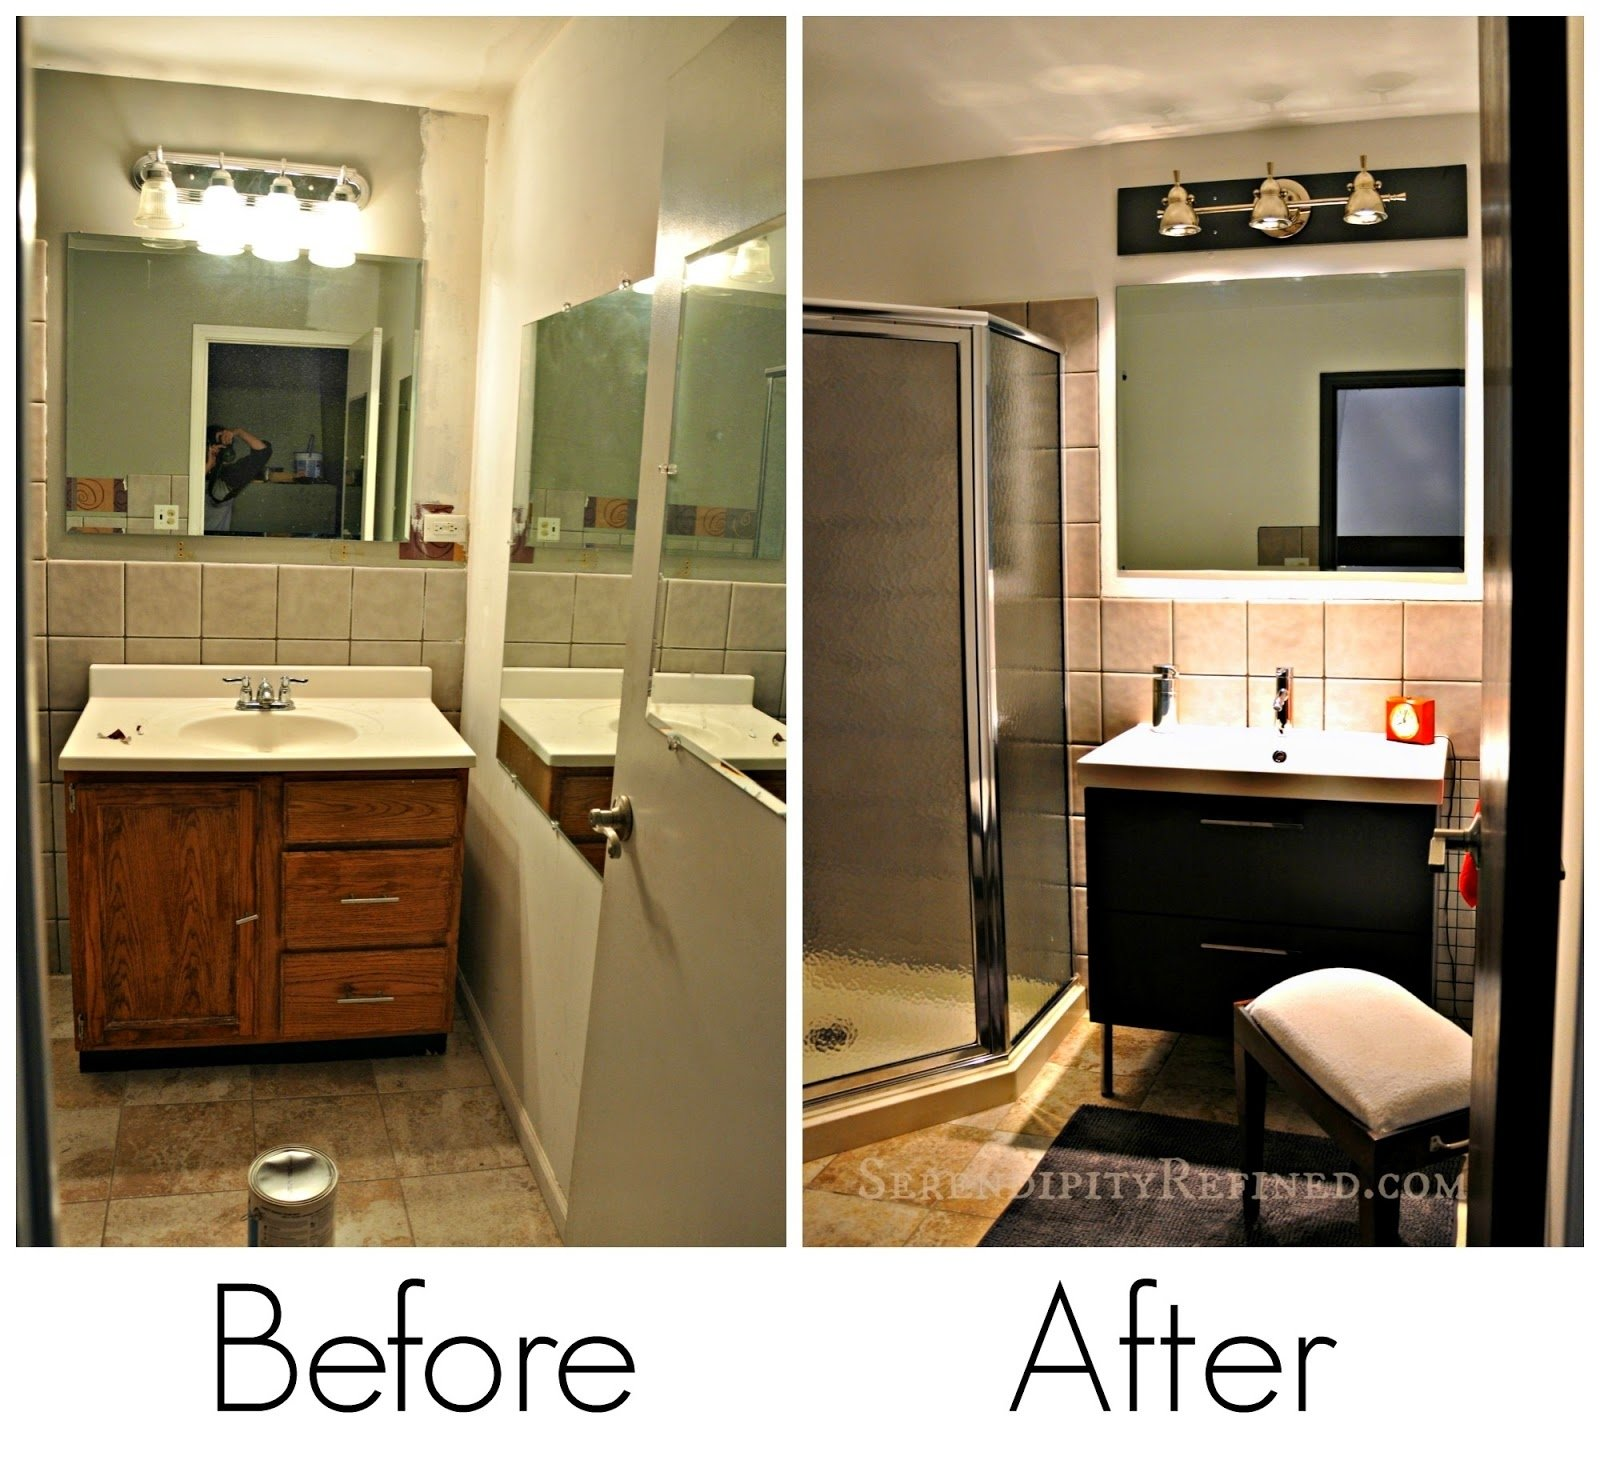 10 Most Popular Diy Decorating Ideas For Apartments apartments design eas interior for small apartment diy bathroom 2020